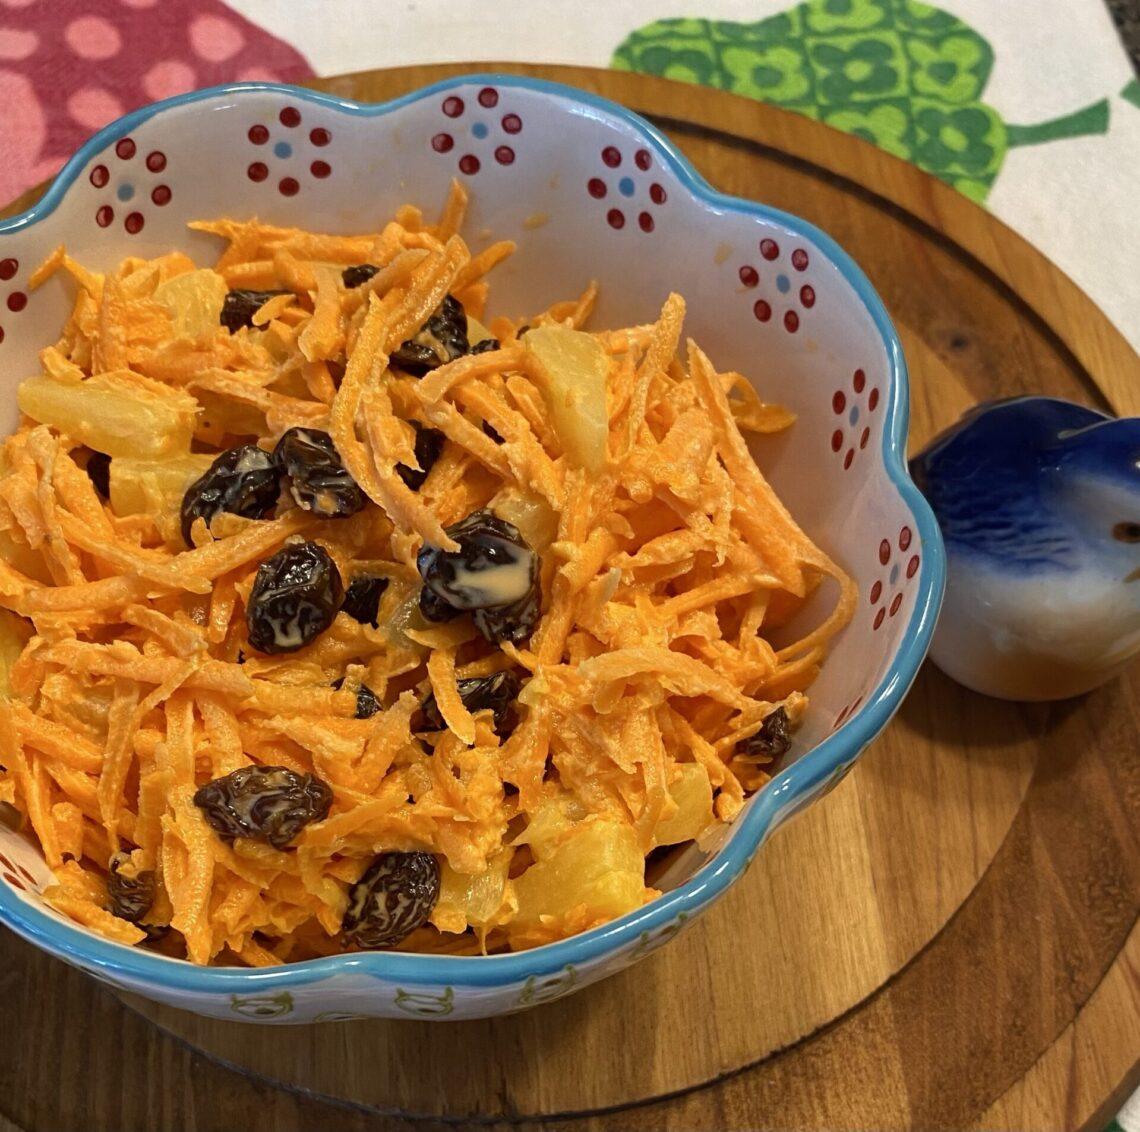 Carrot raisin salad in a bowl